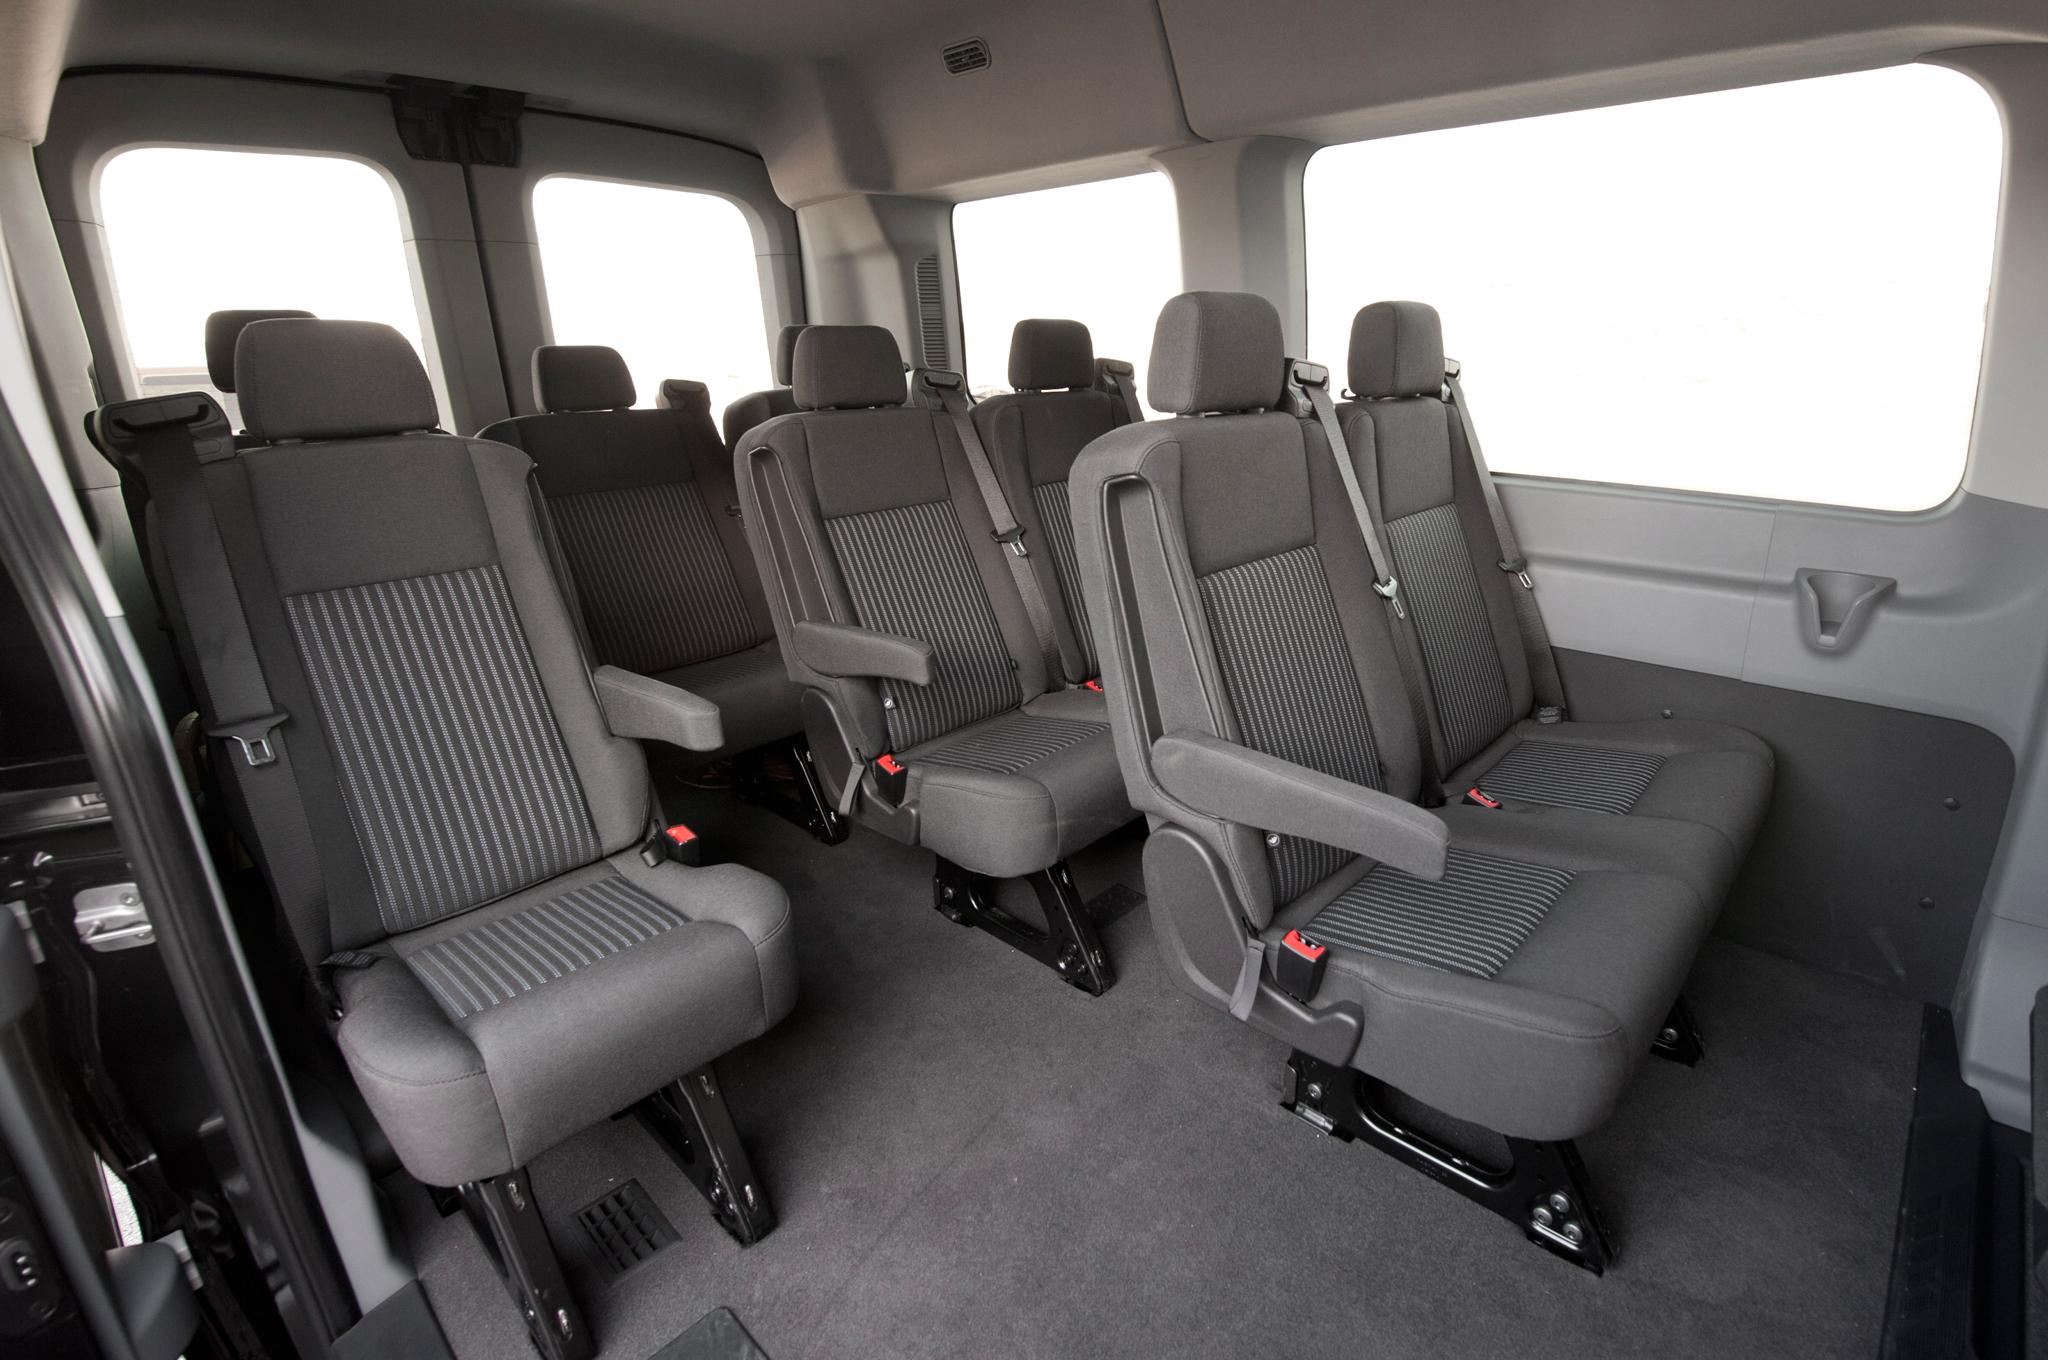 2015 Ford Transit 150 Seats Interior